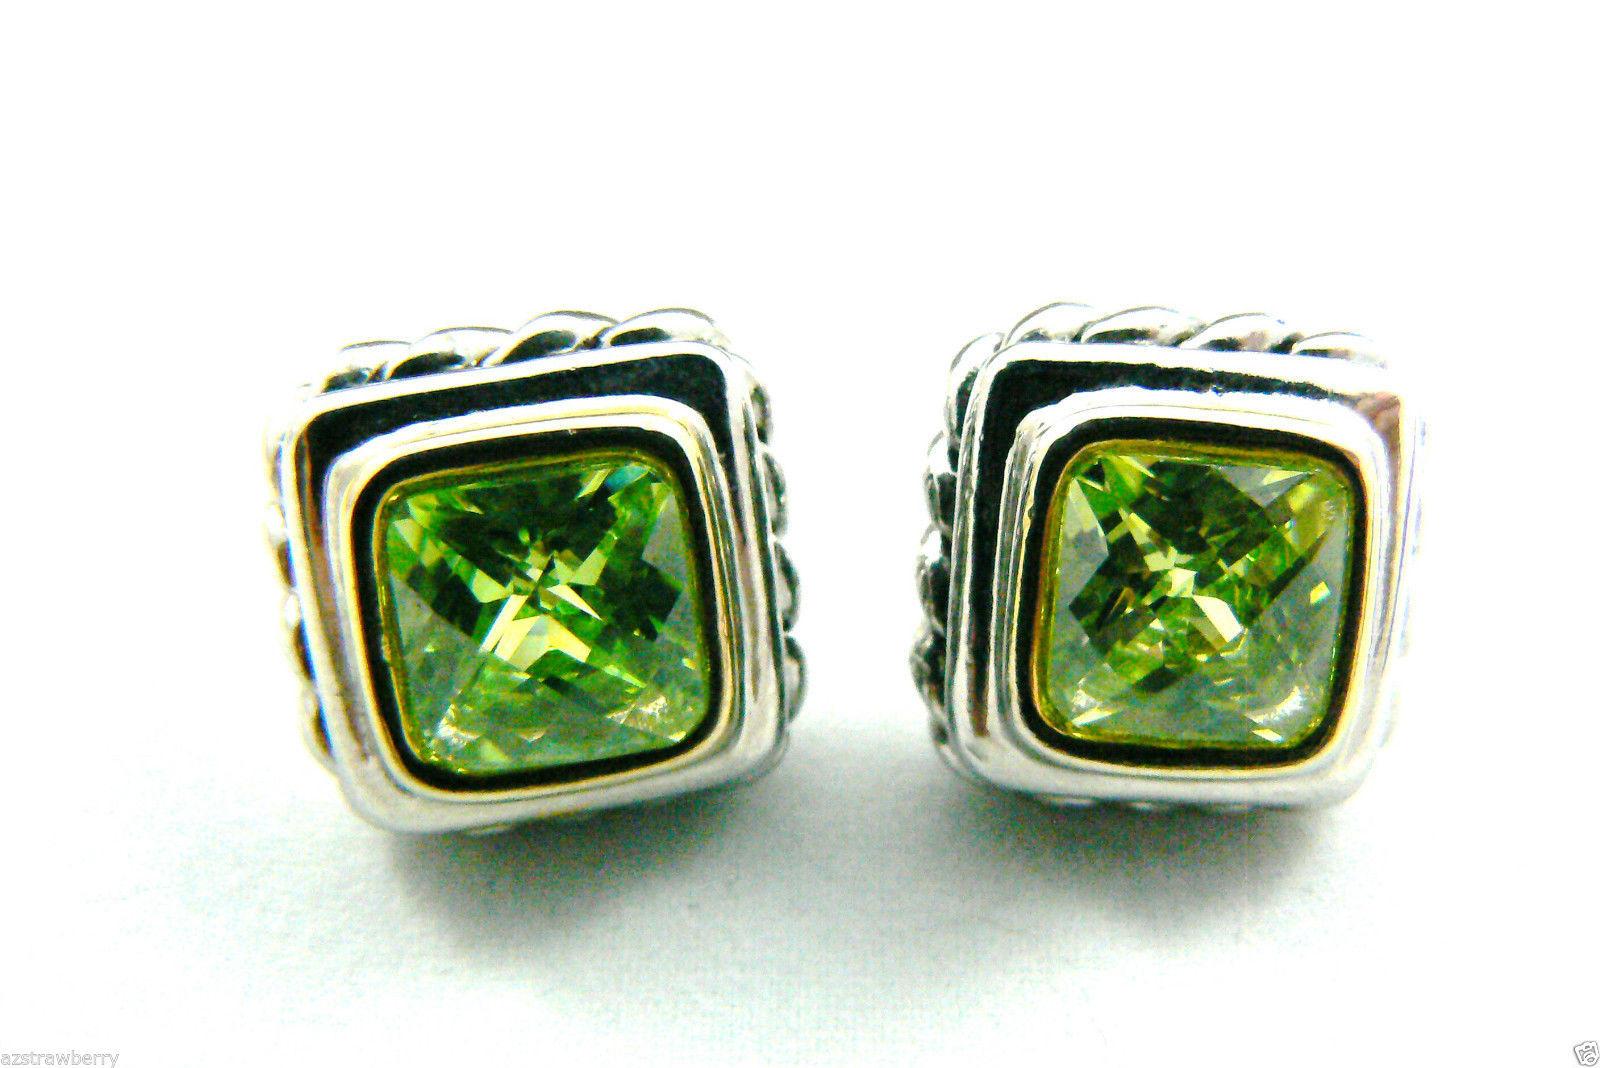 Silver tone Faceted Green Peridot CZ Cubic Zirconia stud earrings $0 sh new image 7